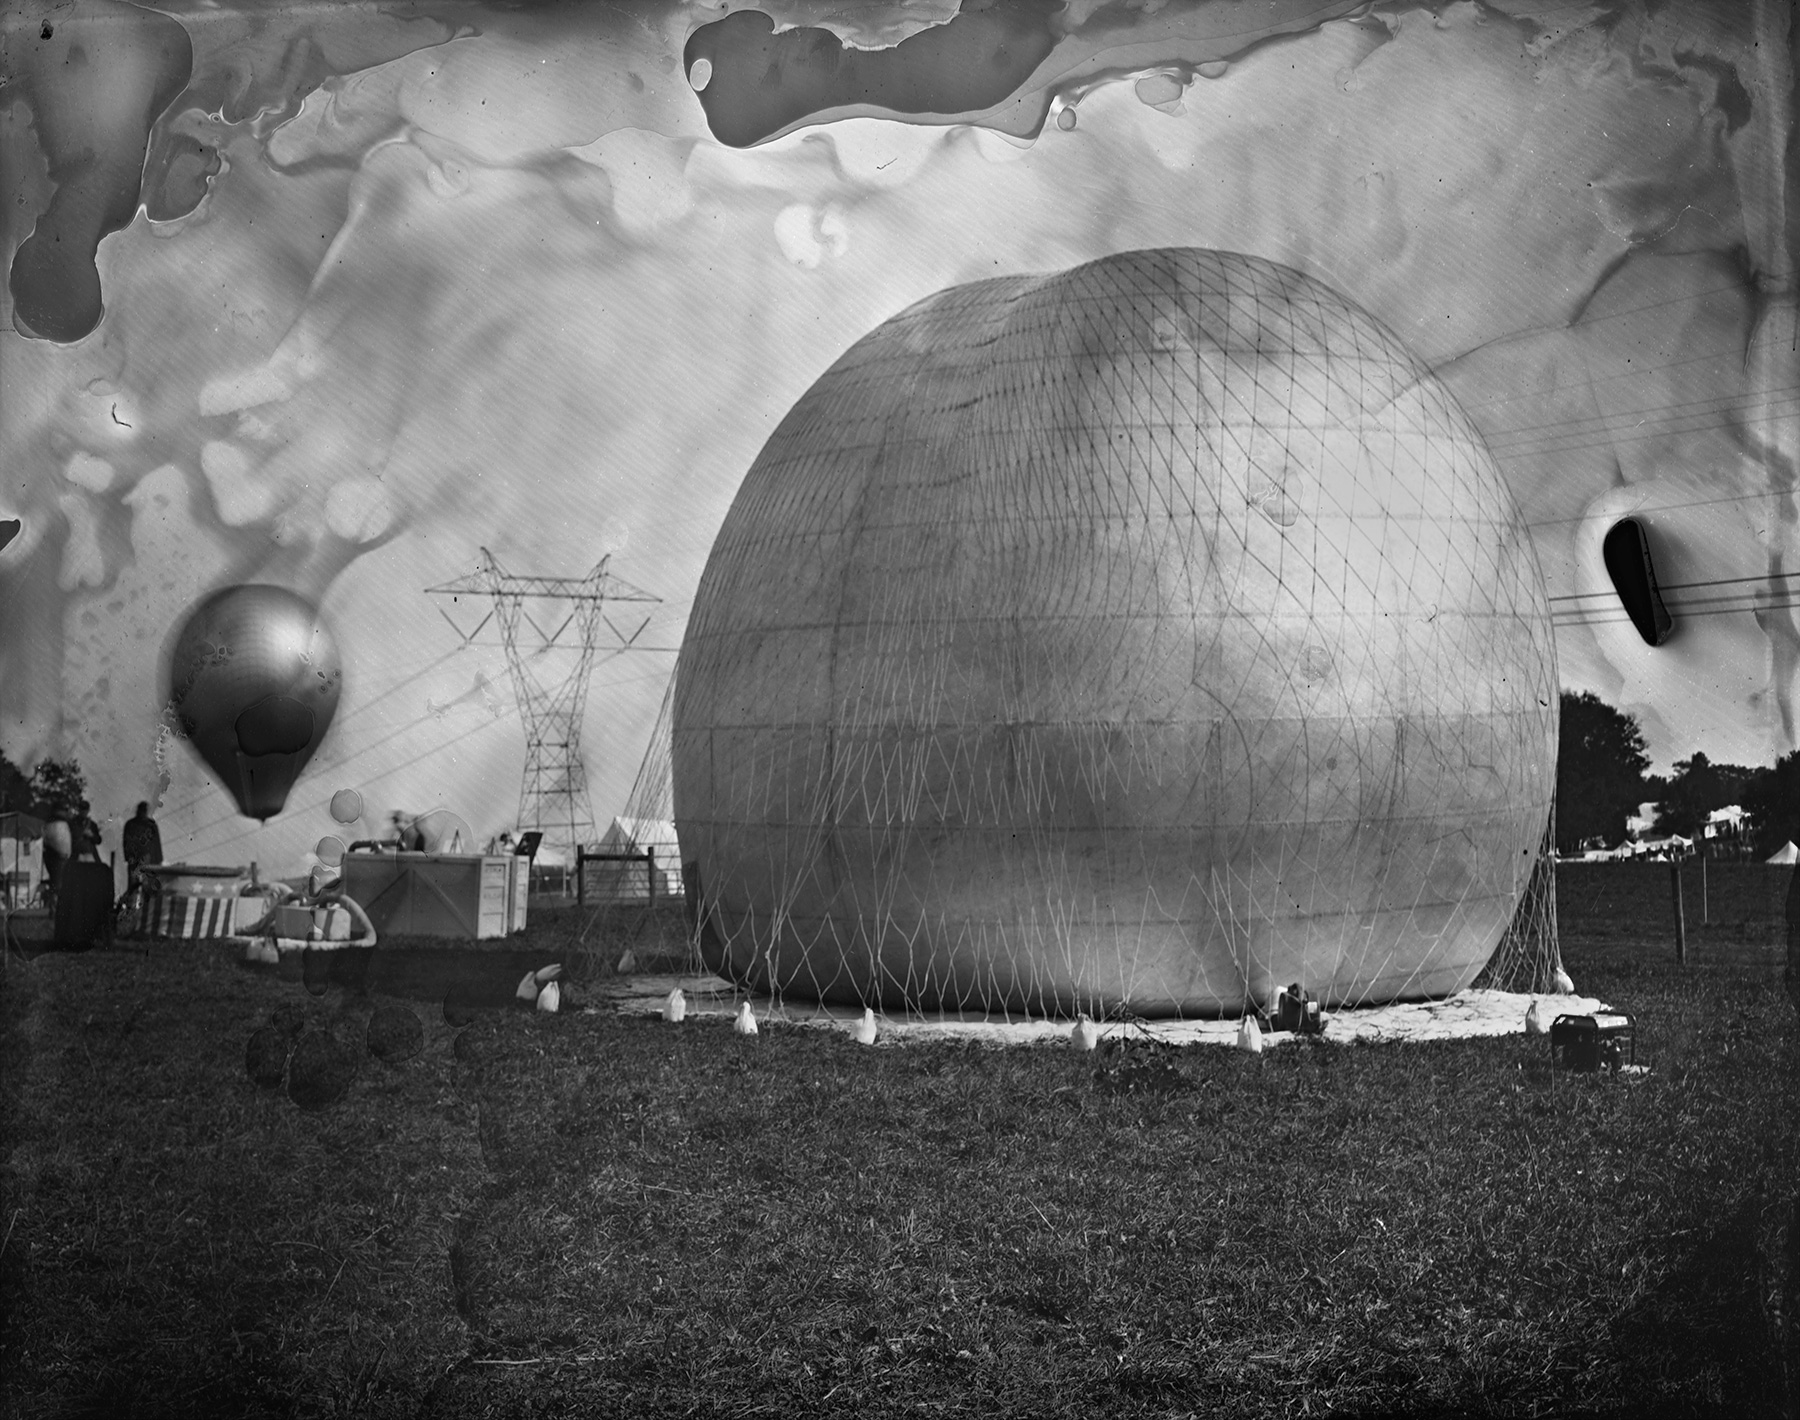 Observation Balloons,  Antietam, 2013